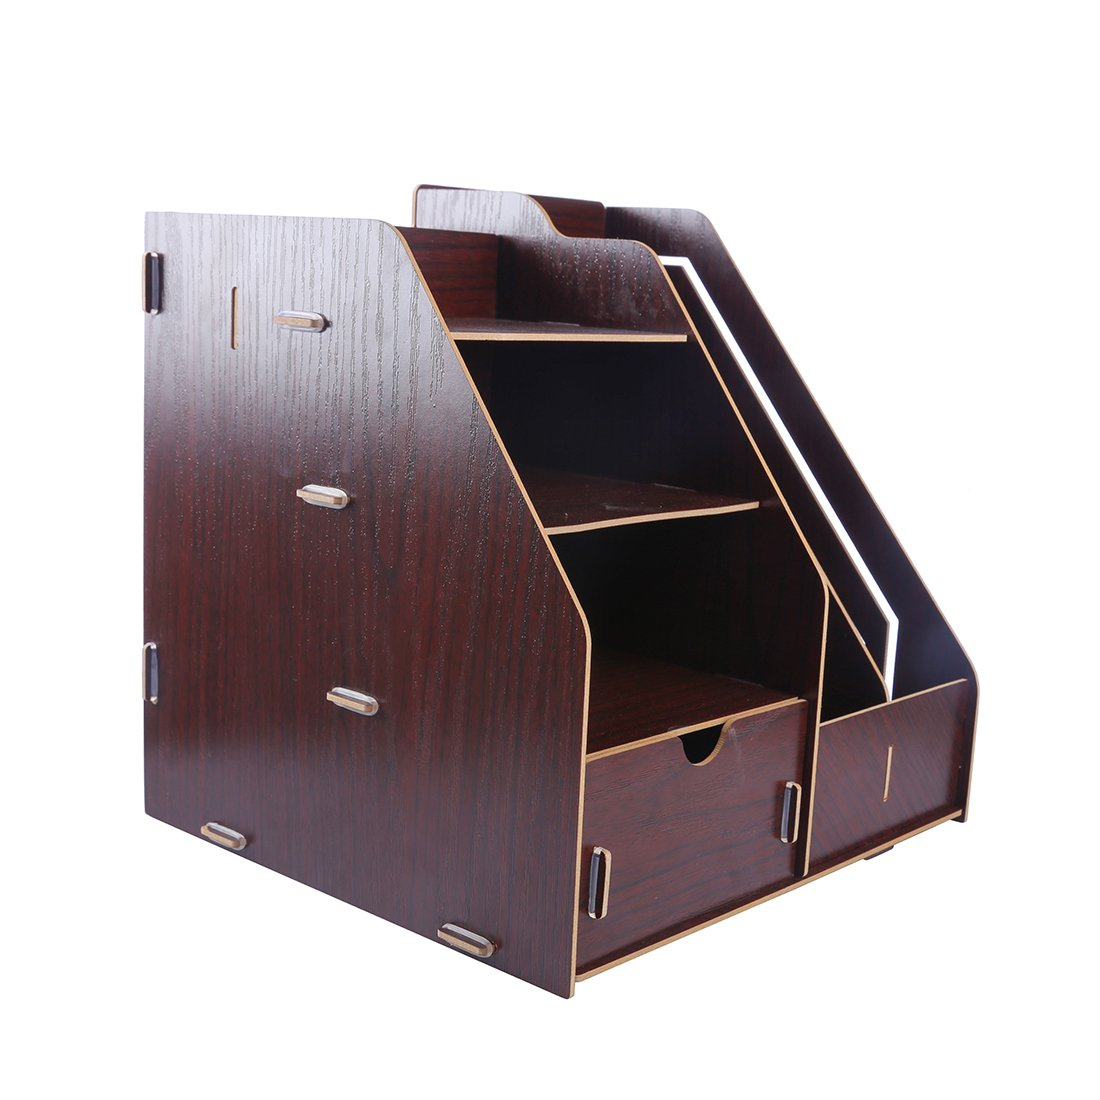 PeleusTech® Office Wood Desk Organizer with Drawer Expandable Mail Sorter Desktop Stationary Organizer -